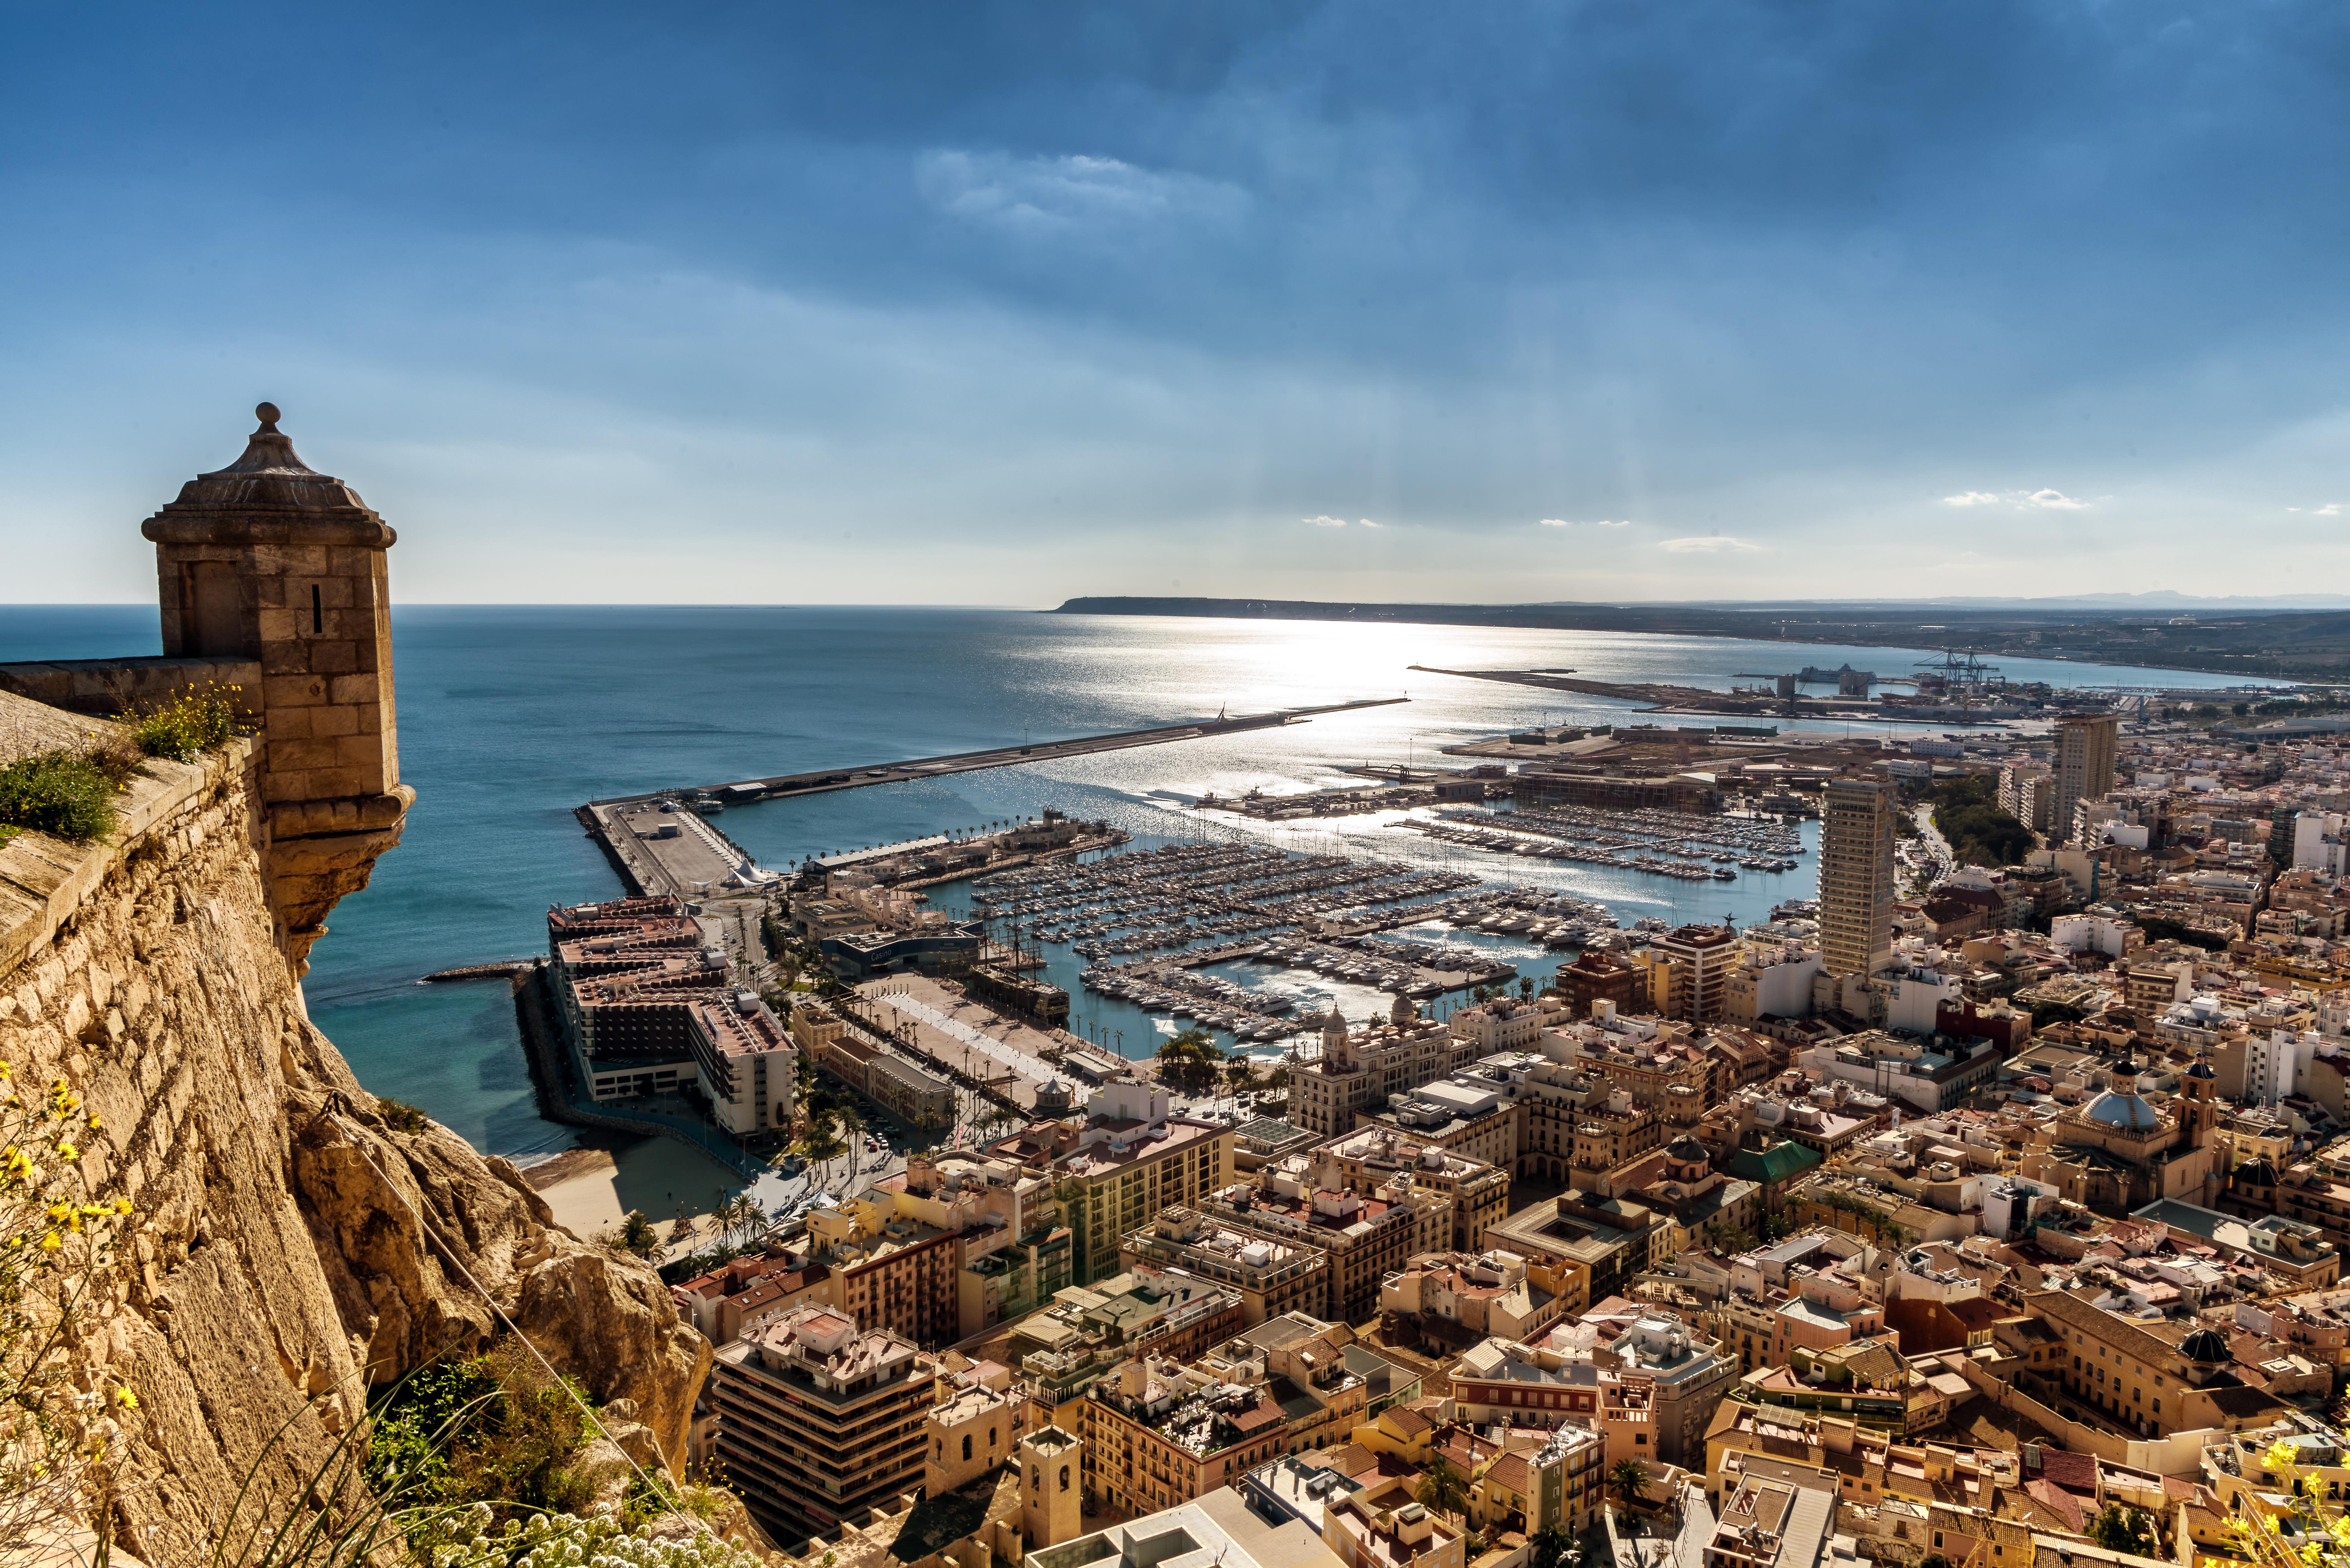 Summer Program - Spanish | CIEE High School Summer Abroad: Intensive Spanish Language & Culture in Alicante, Spain